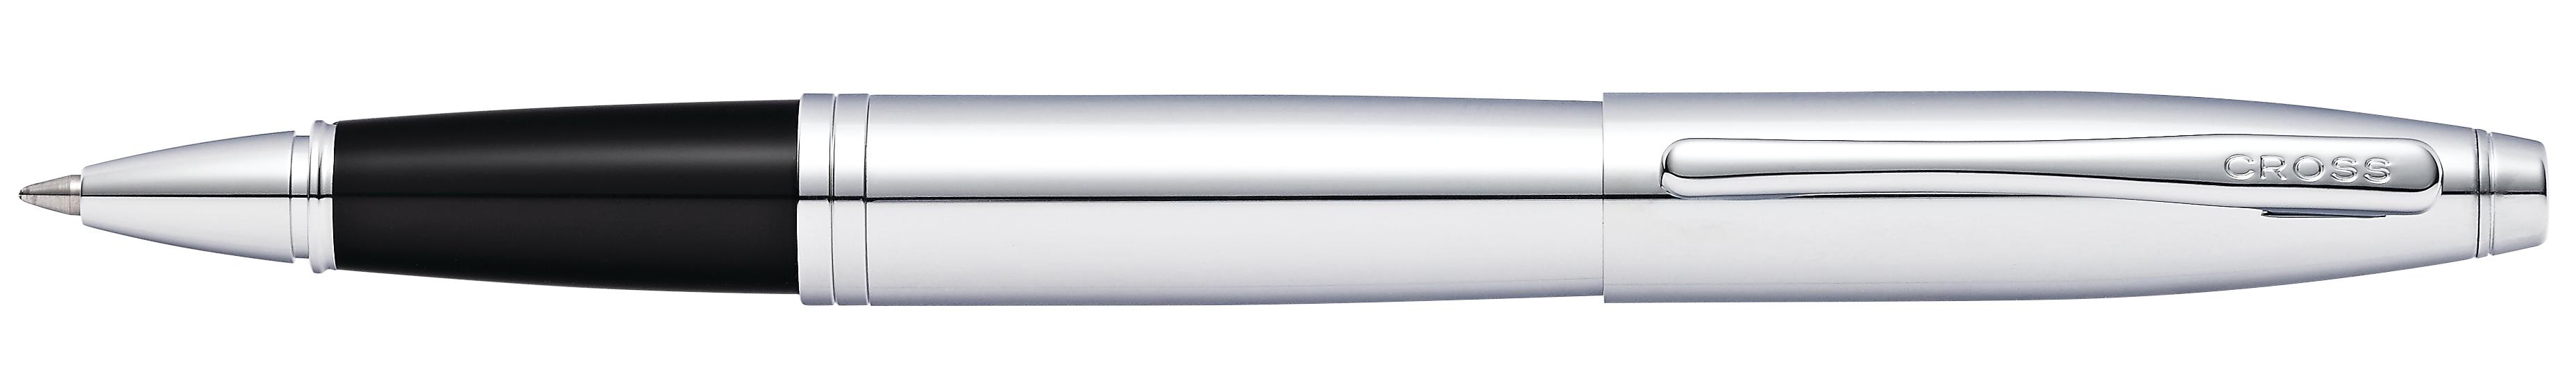 Calais Polished Chrome Rollerball Pen